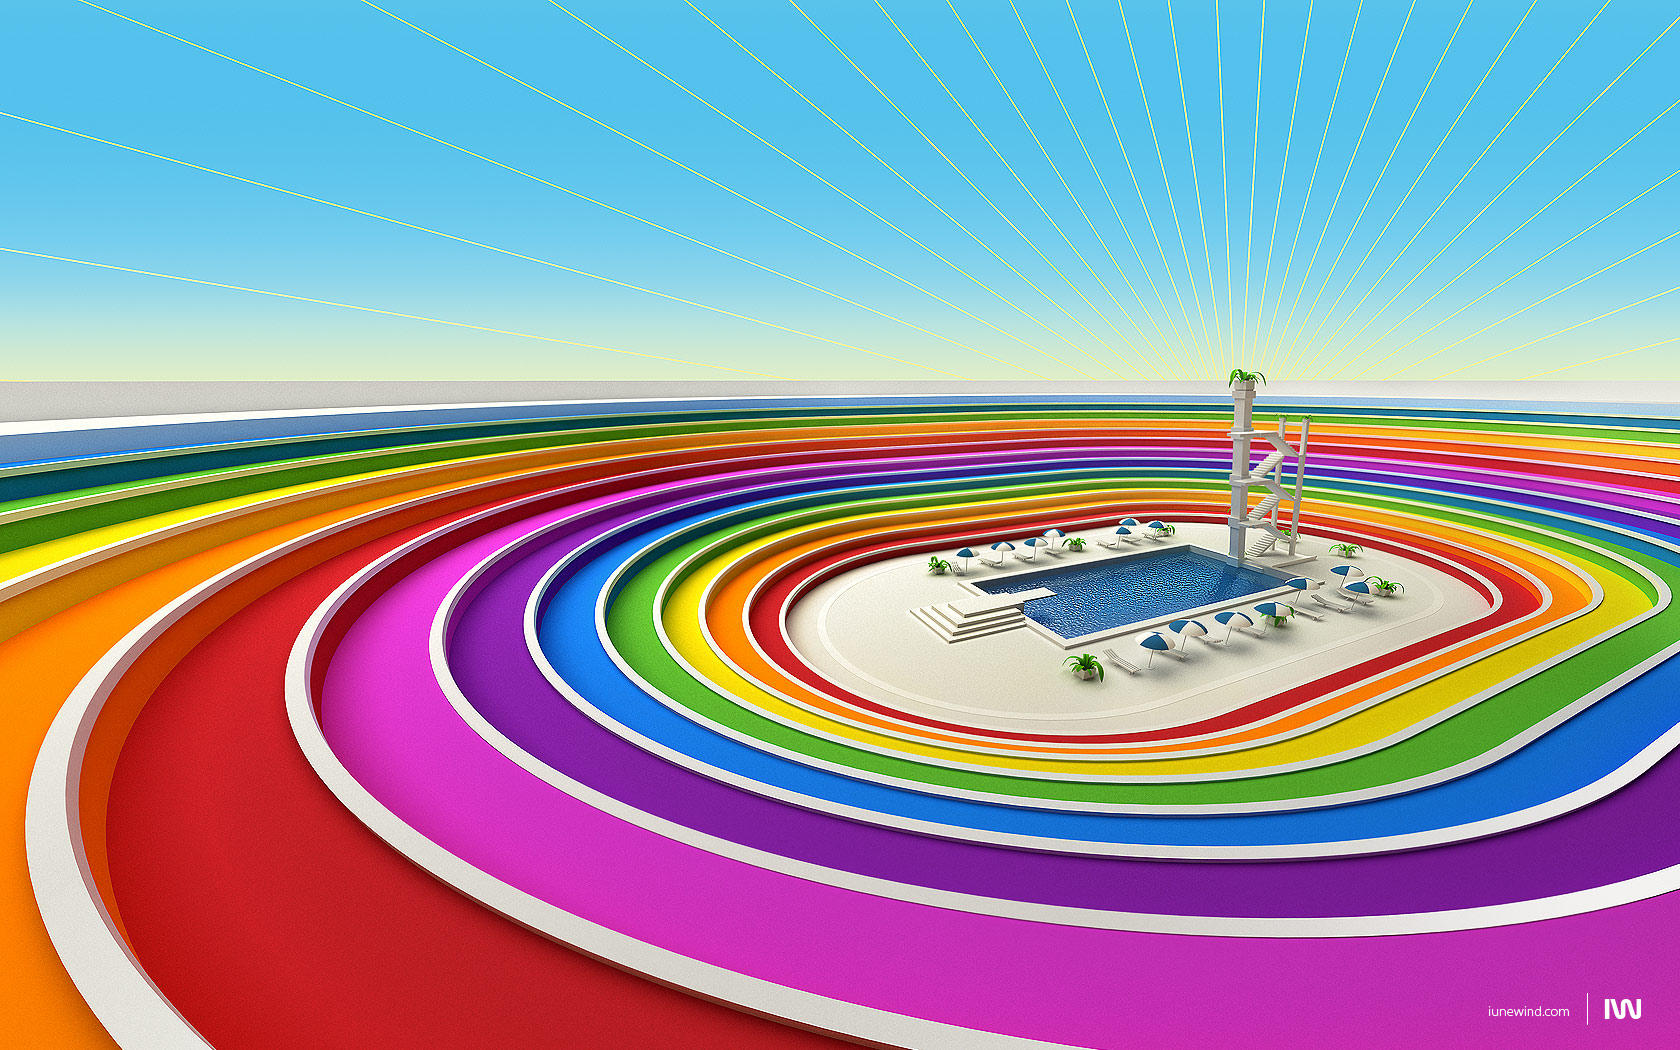 Colored stadium by iuneWind